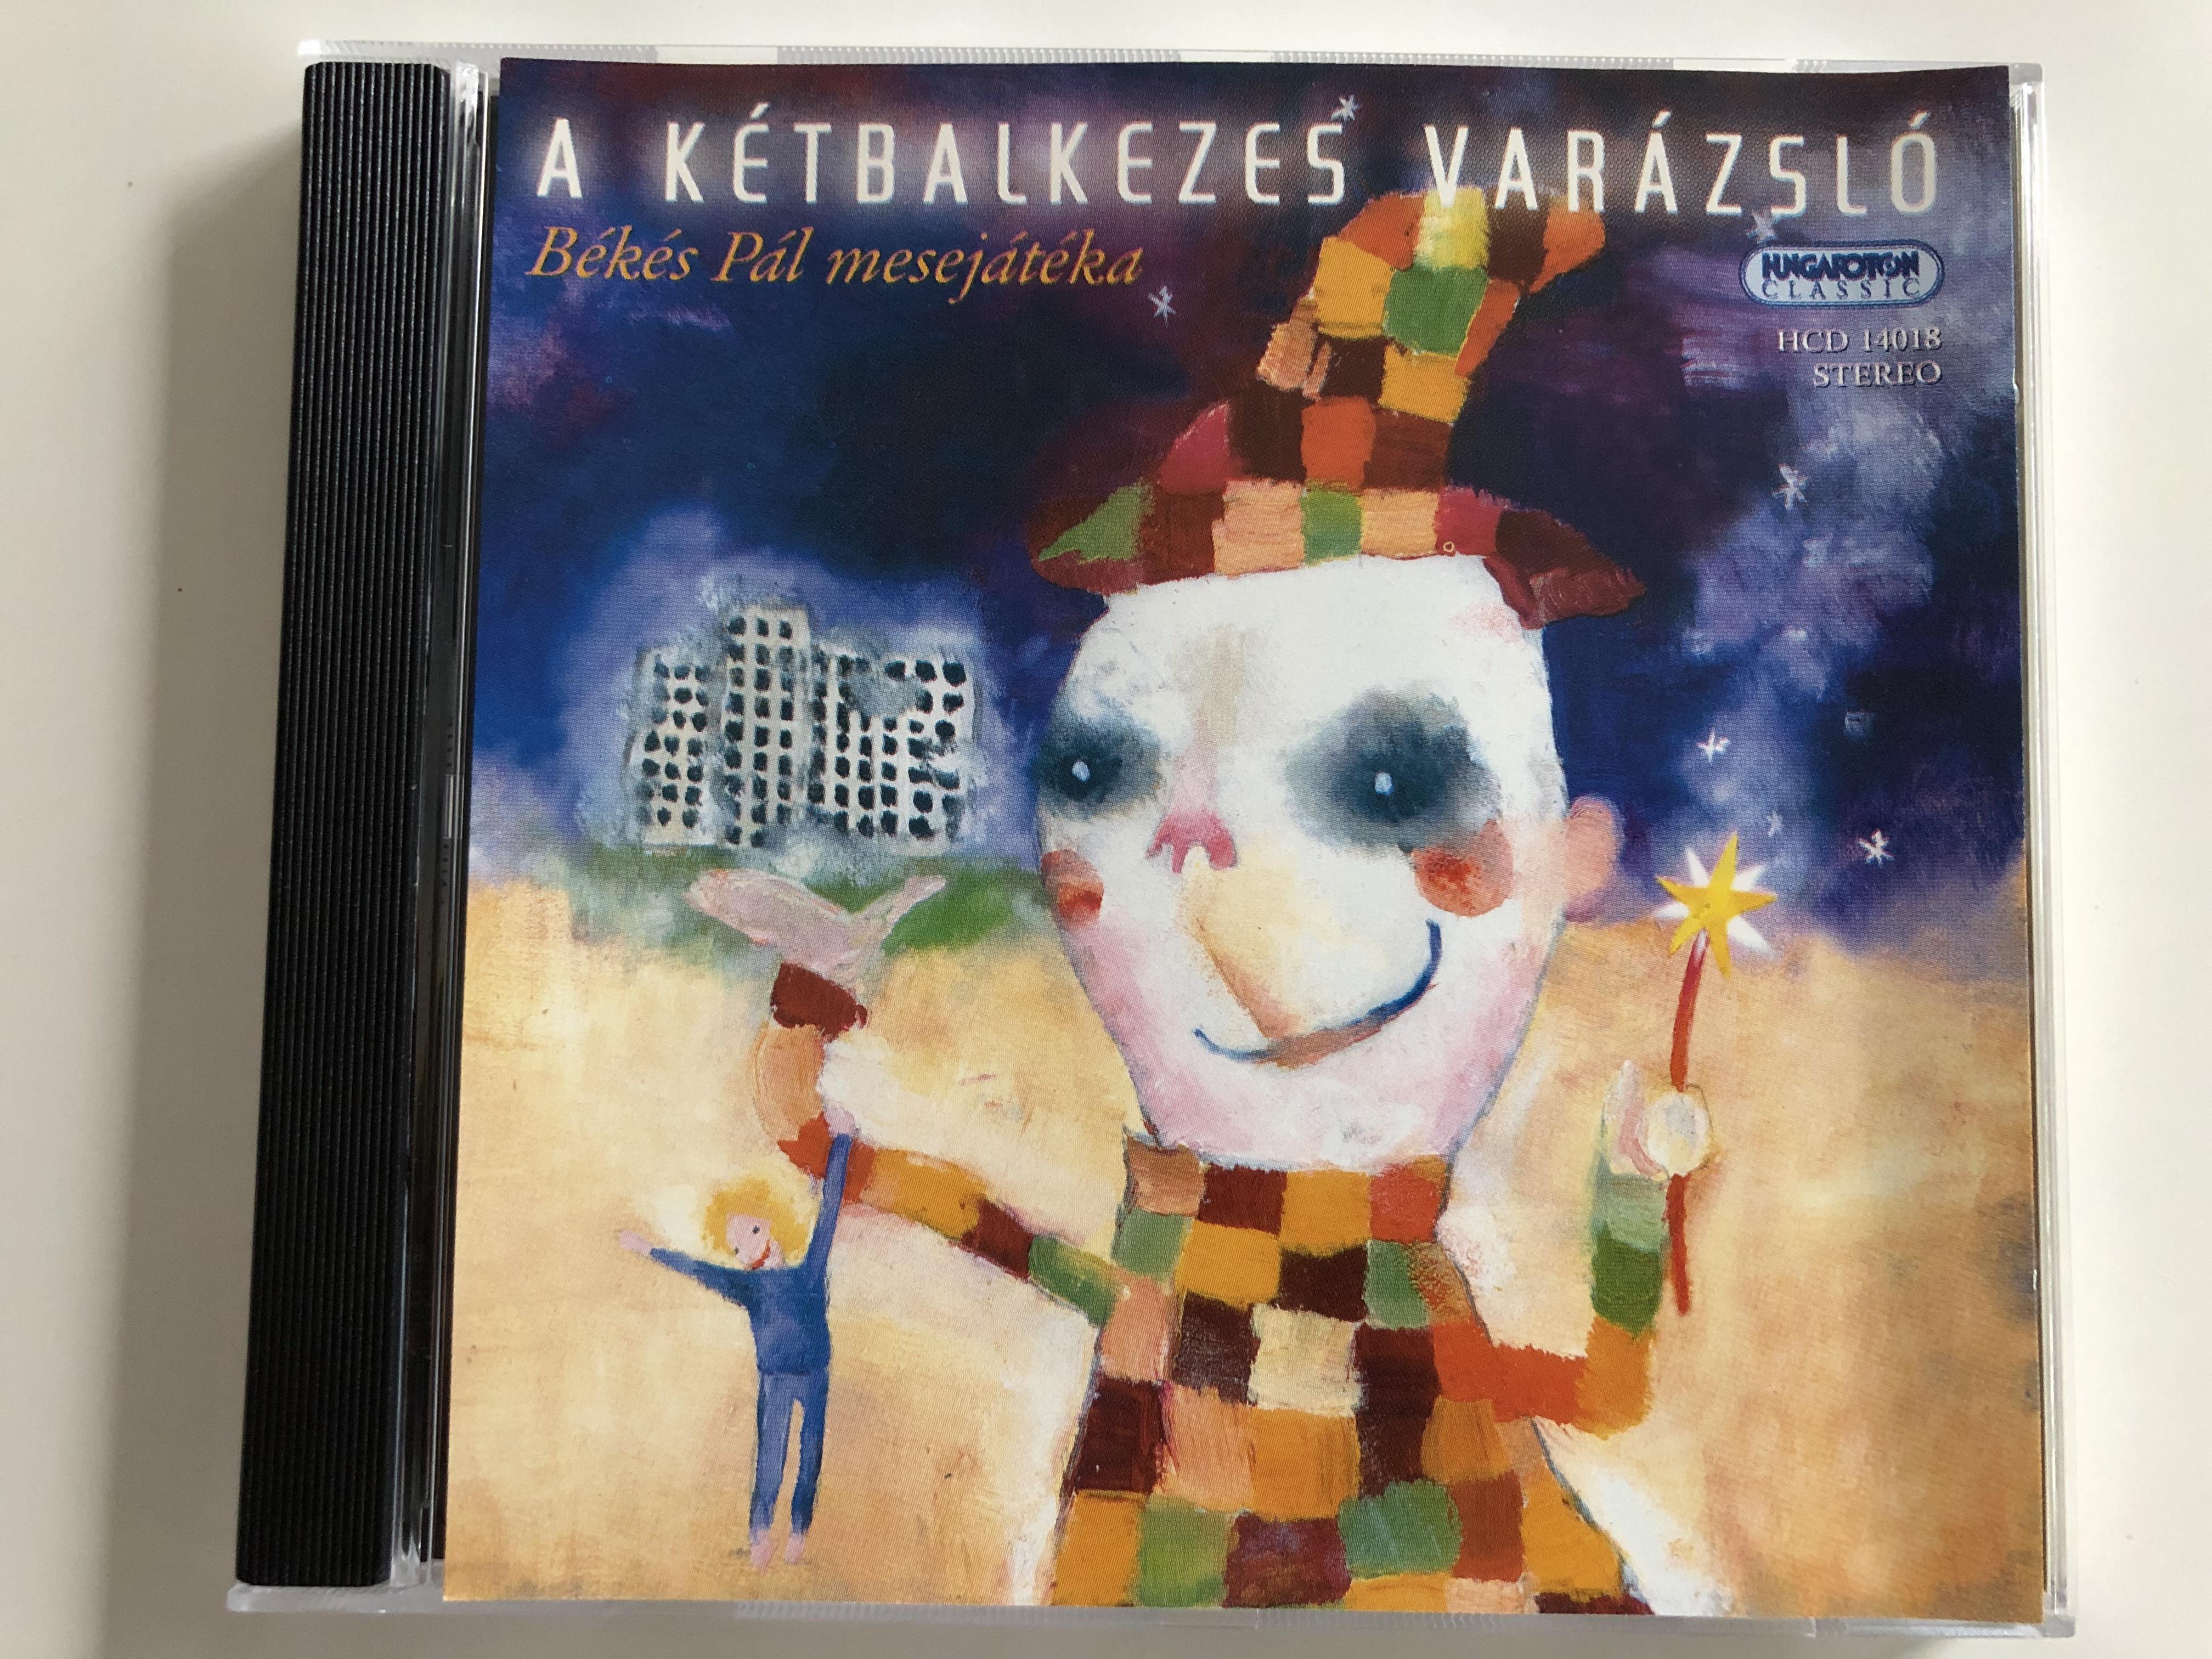 a-k-tbalkezes-var-zsl-b-k-s-p-l-mesej-t-ka-the-clumsy-magician-hungarian-radioplay-for-children-music-by-berkes-g-bor-hungaroton-classic-audio-cd-2003-hcd-14018-1-.jpg